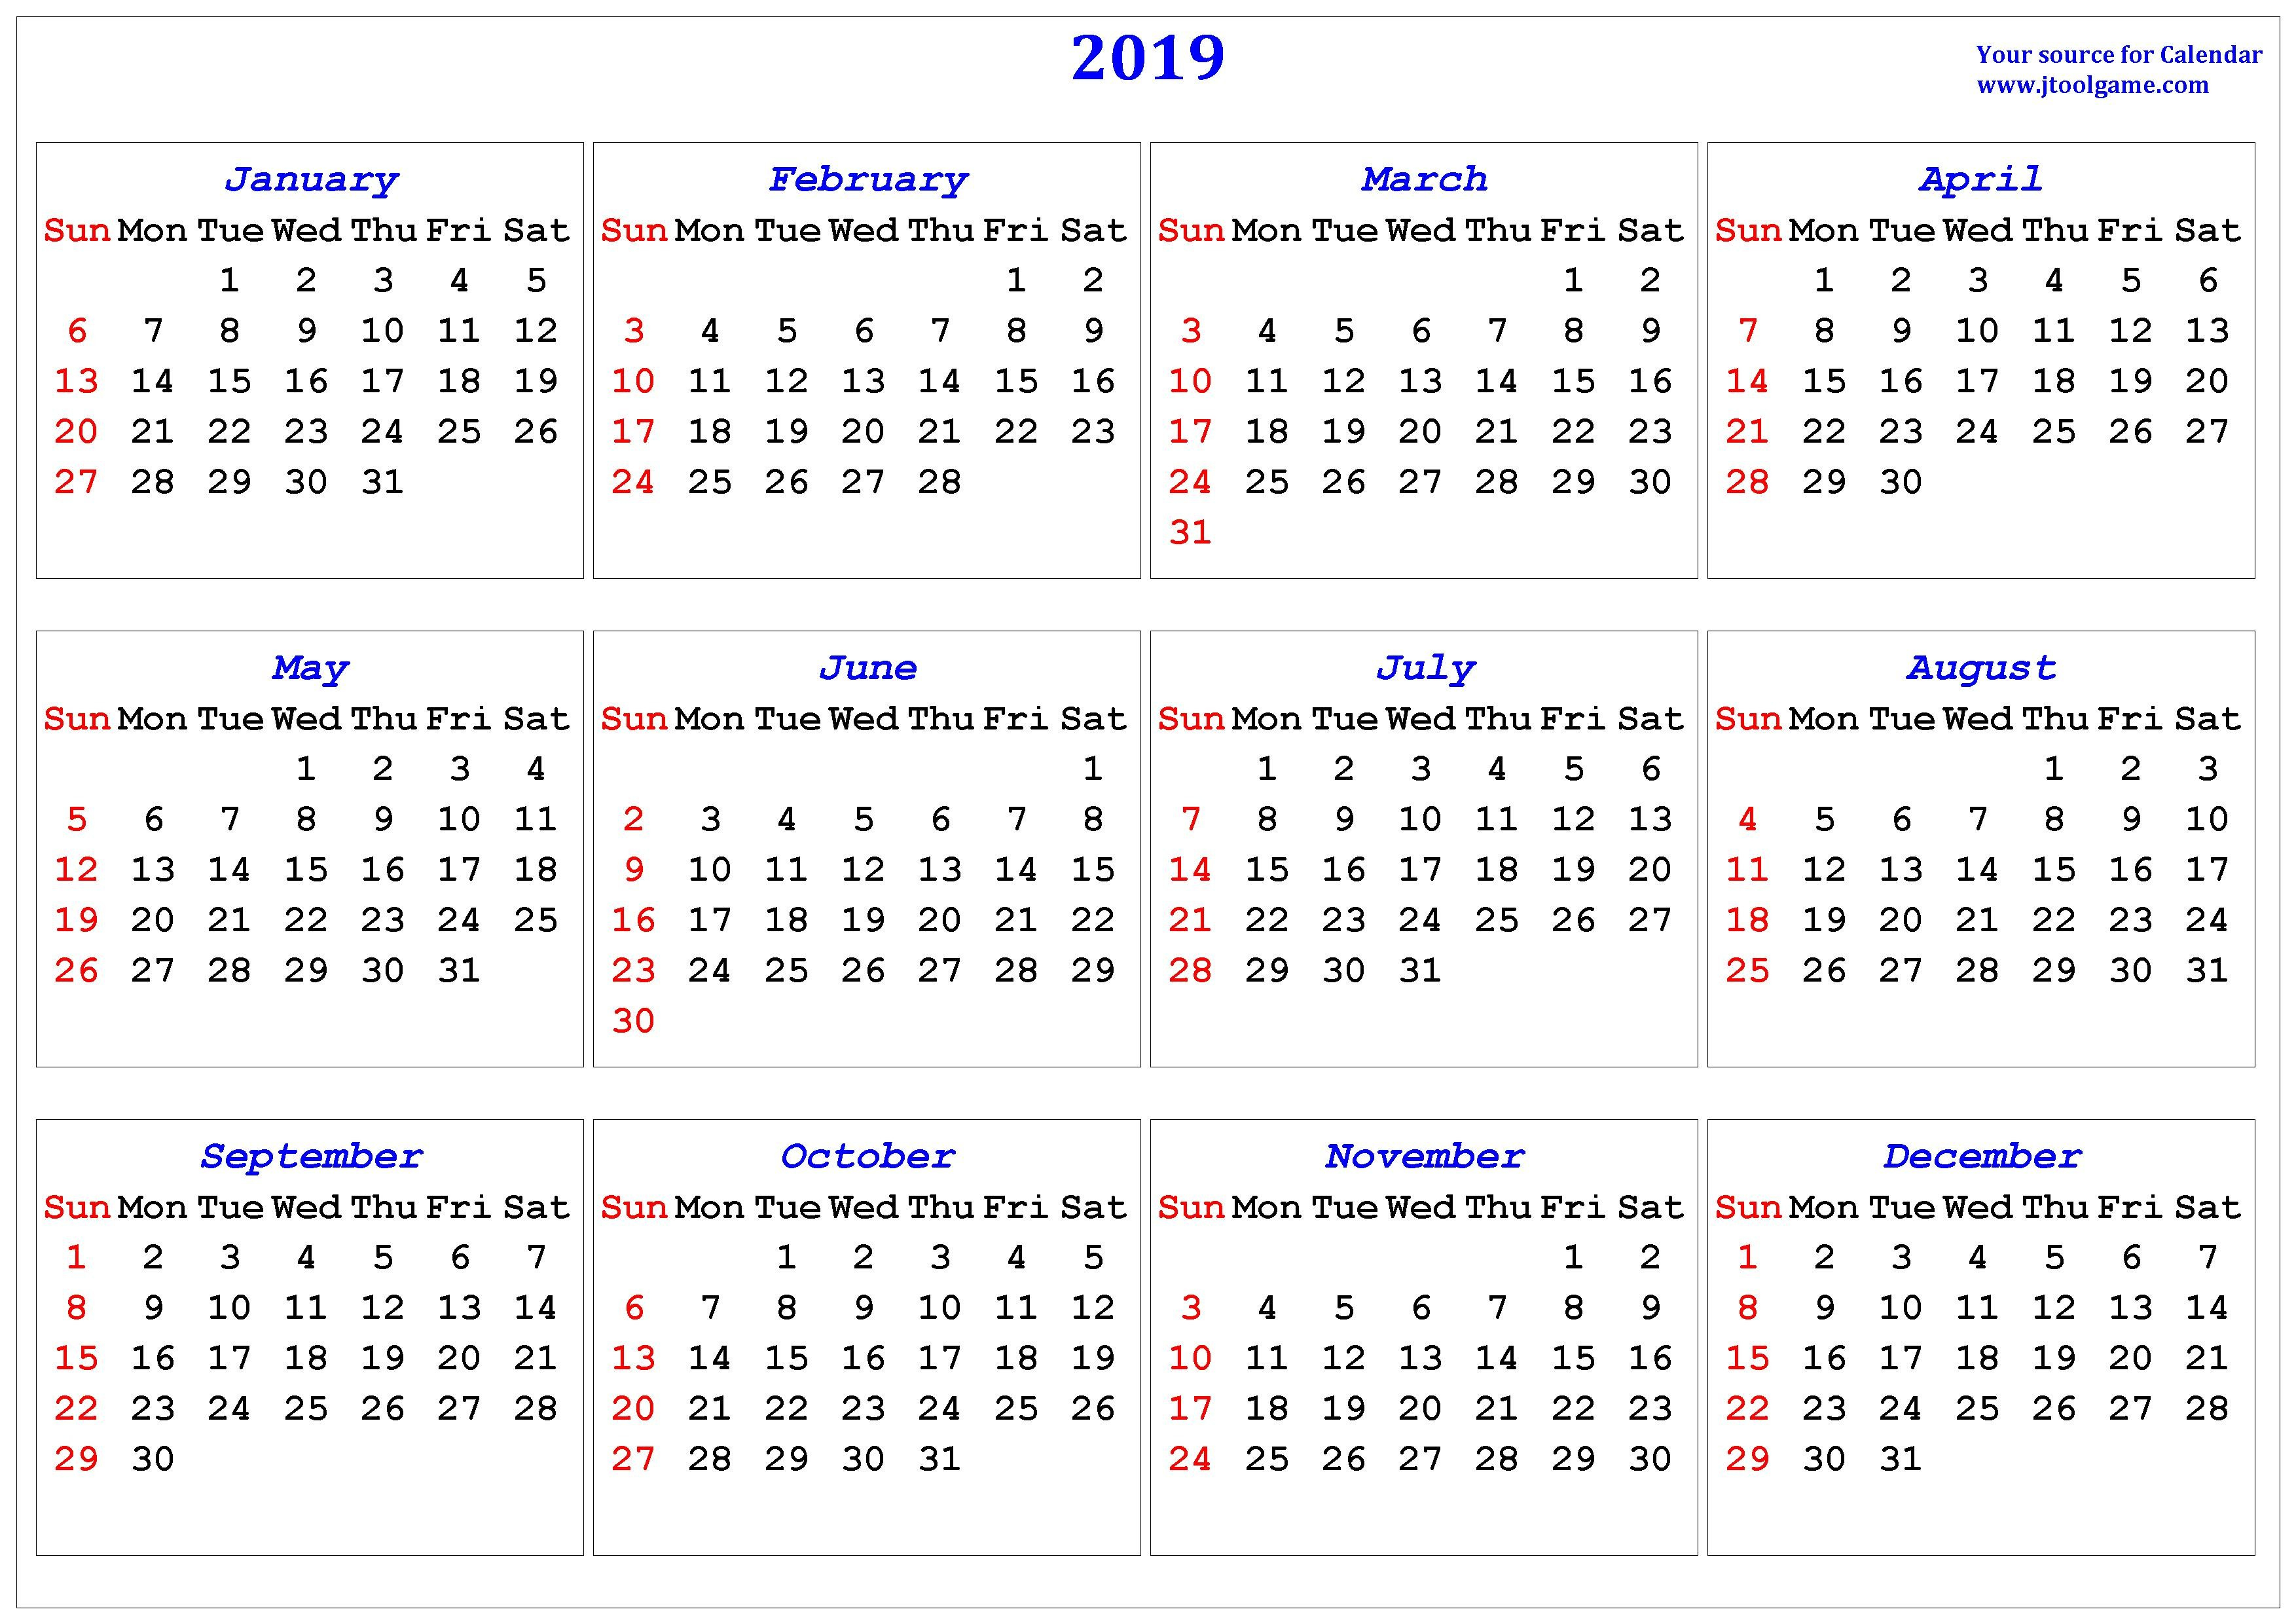 2019 Calendar – Printable Calendar. 2019 Calendar In Multiple Colors Calendar 2019 Landscape